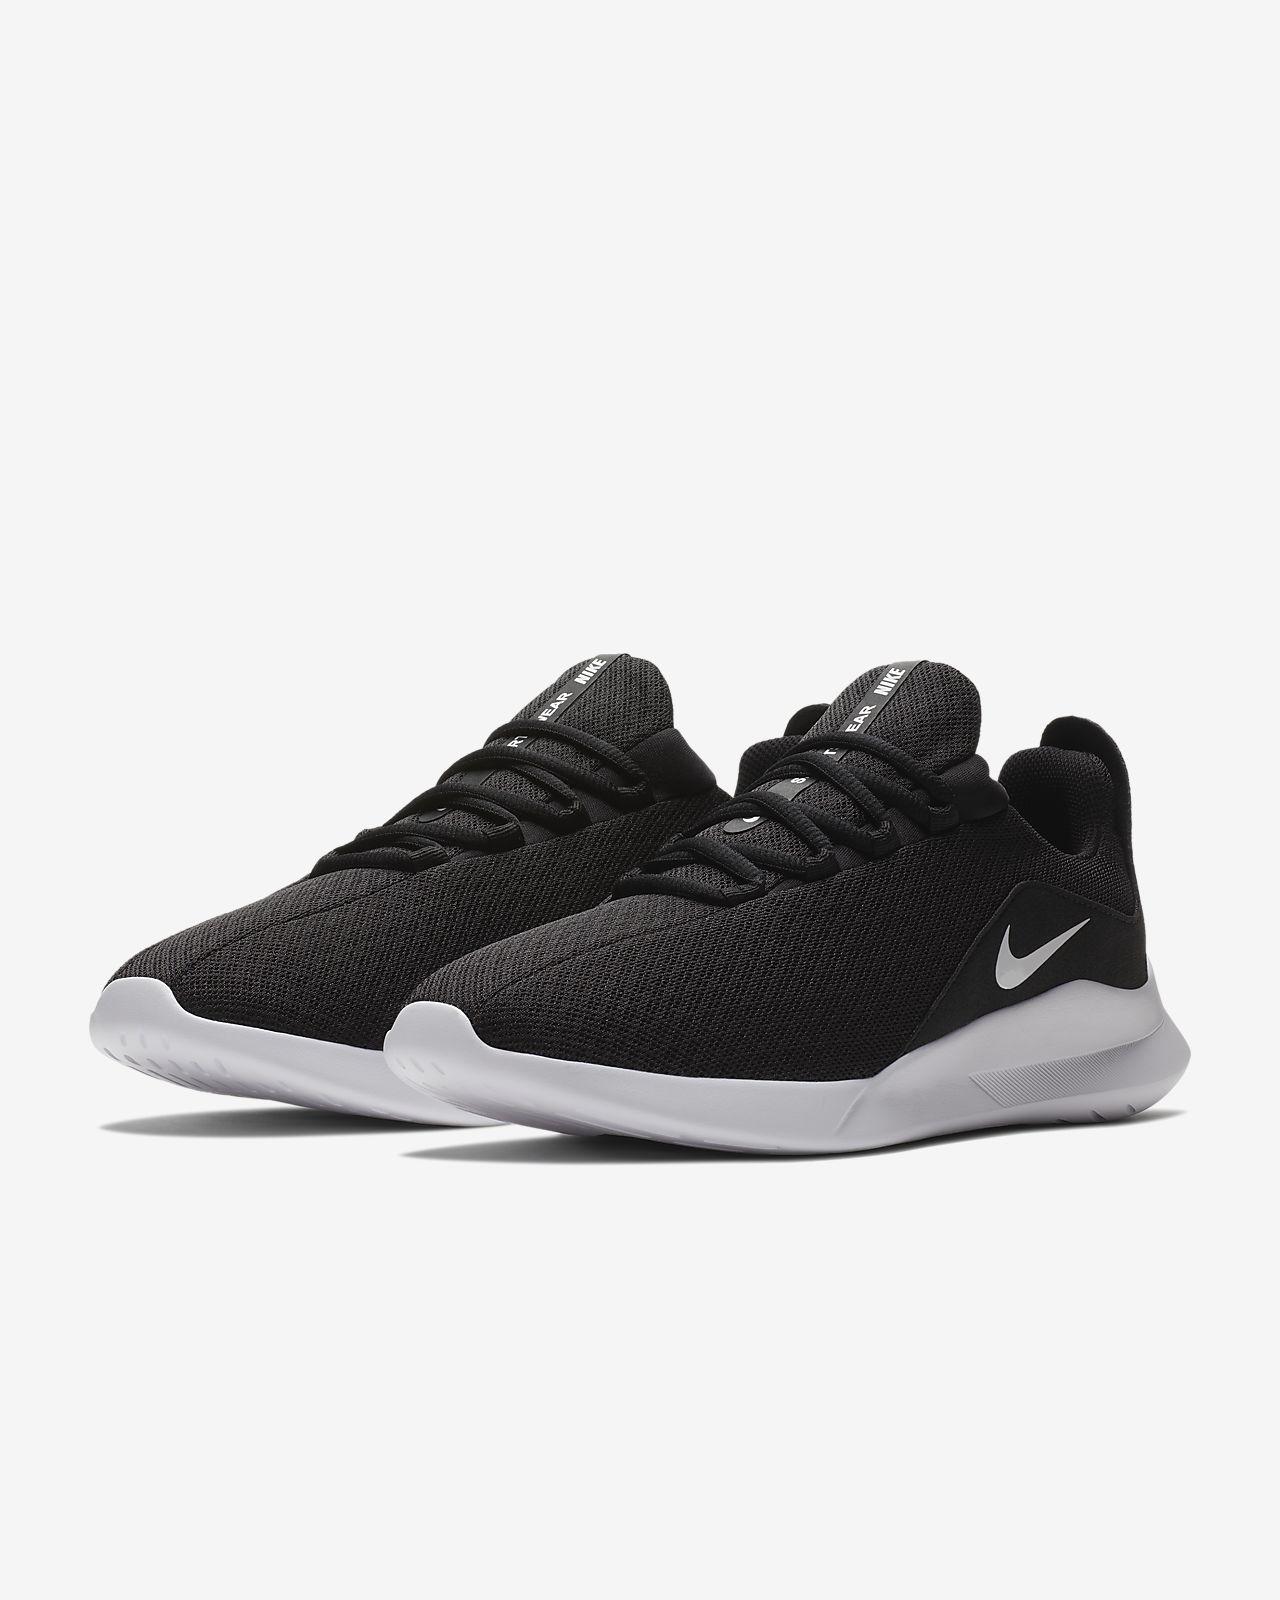 check out b4c3a eb380 Men s Shoe. Nike Viale